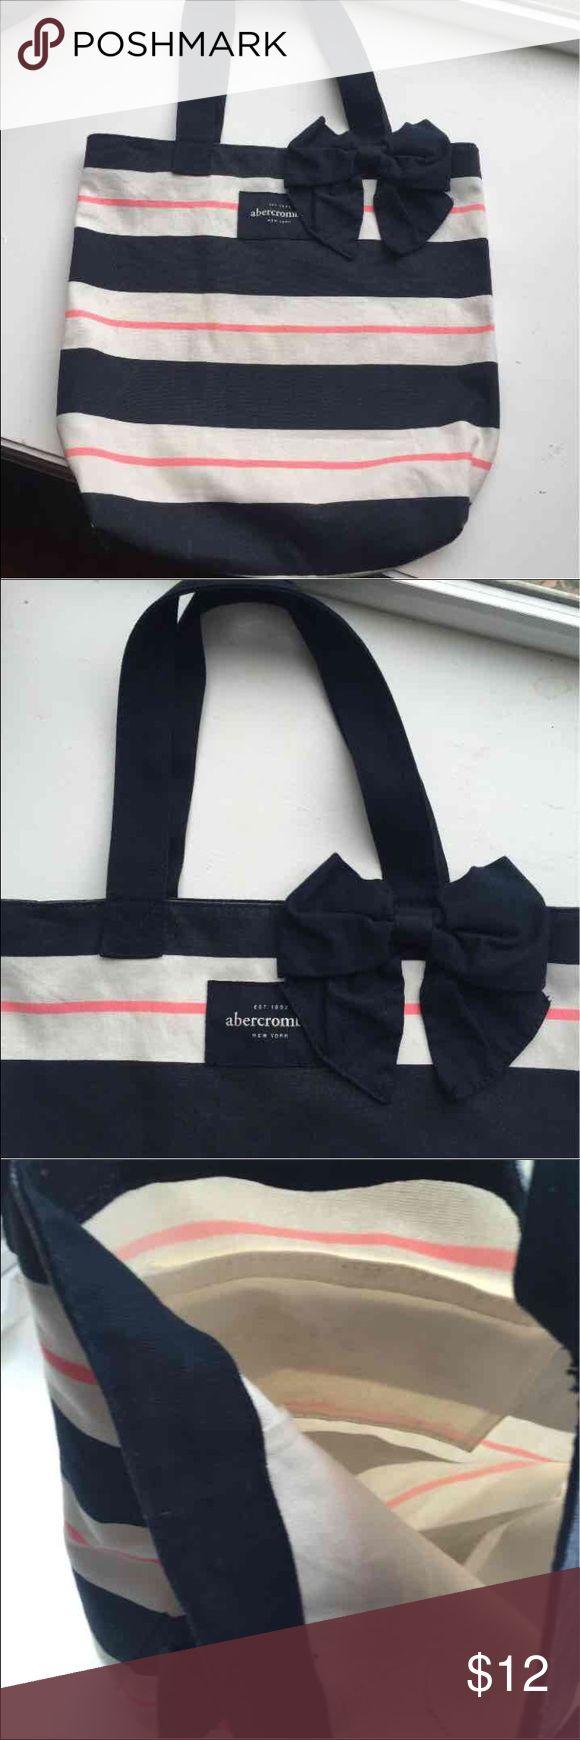 Abercrombie Tote bag Abercrombie white/blue/pink tote bag/book bag Abercrombie & Fitch Bags Totes